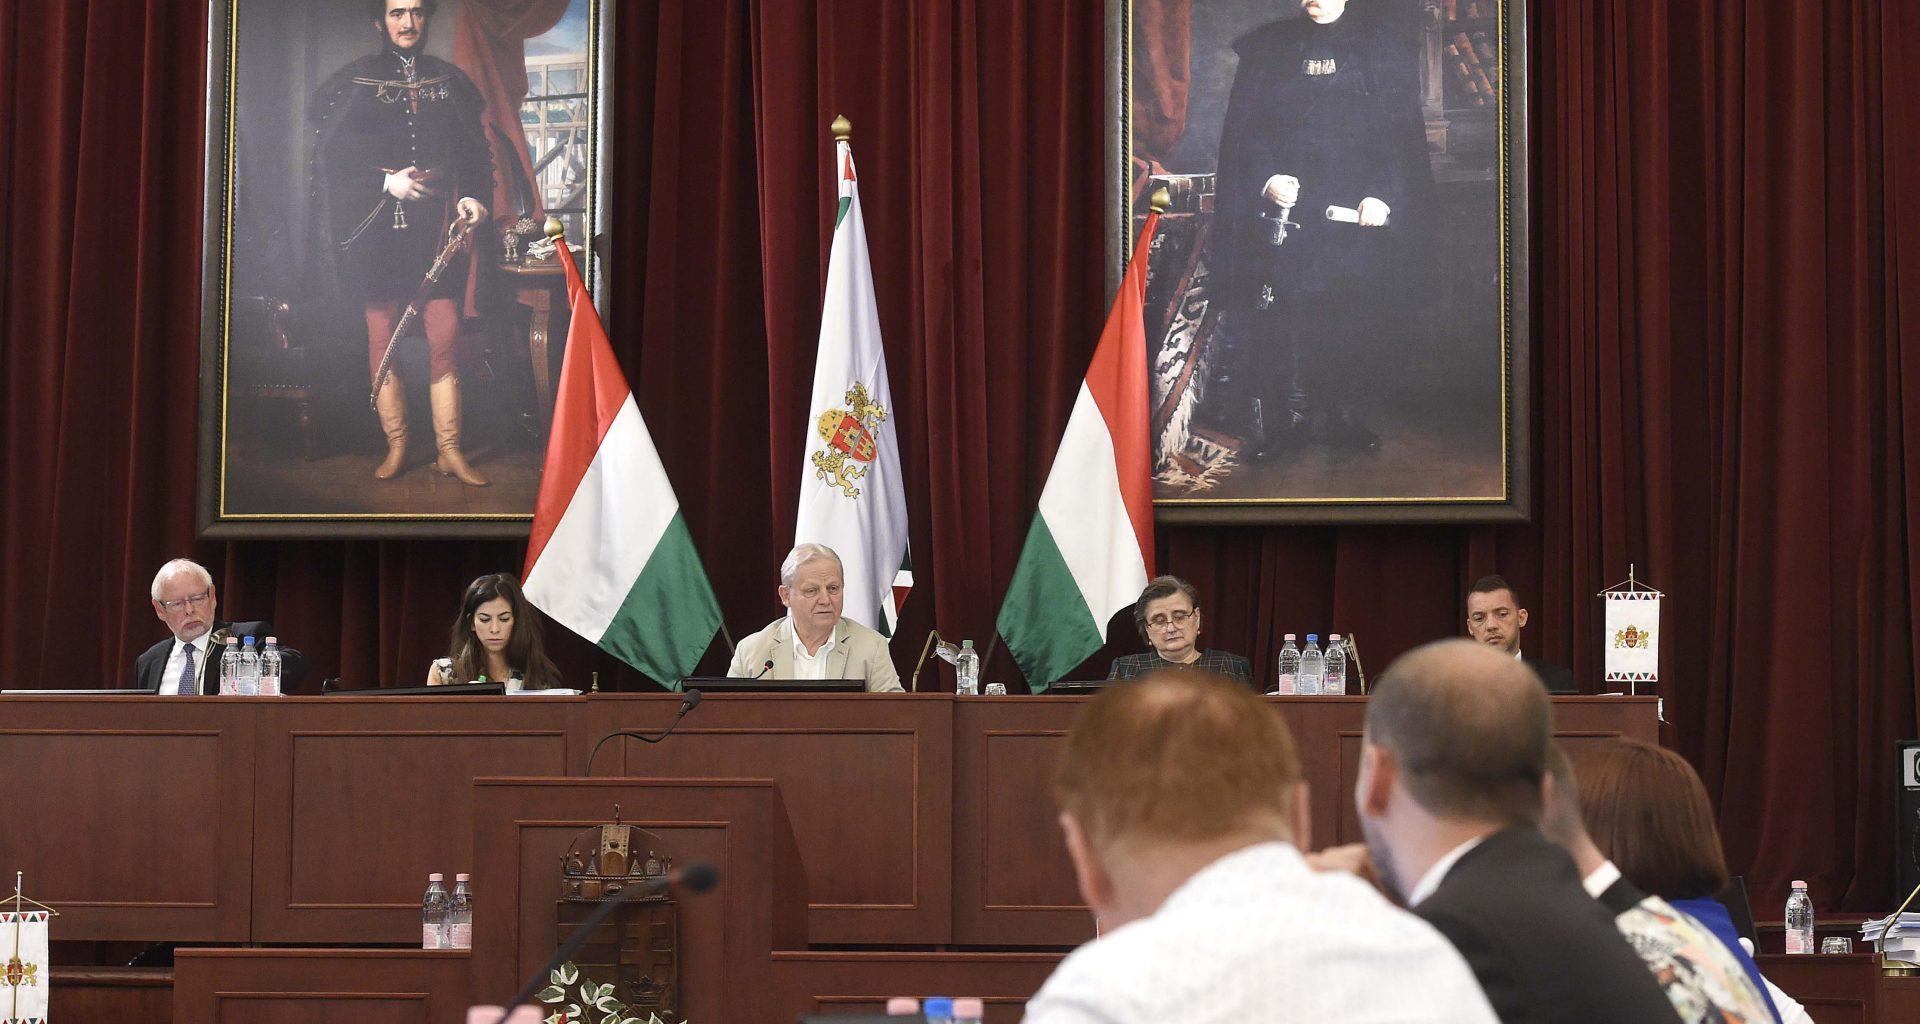 tarlós budapest council